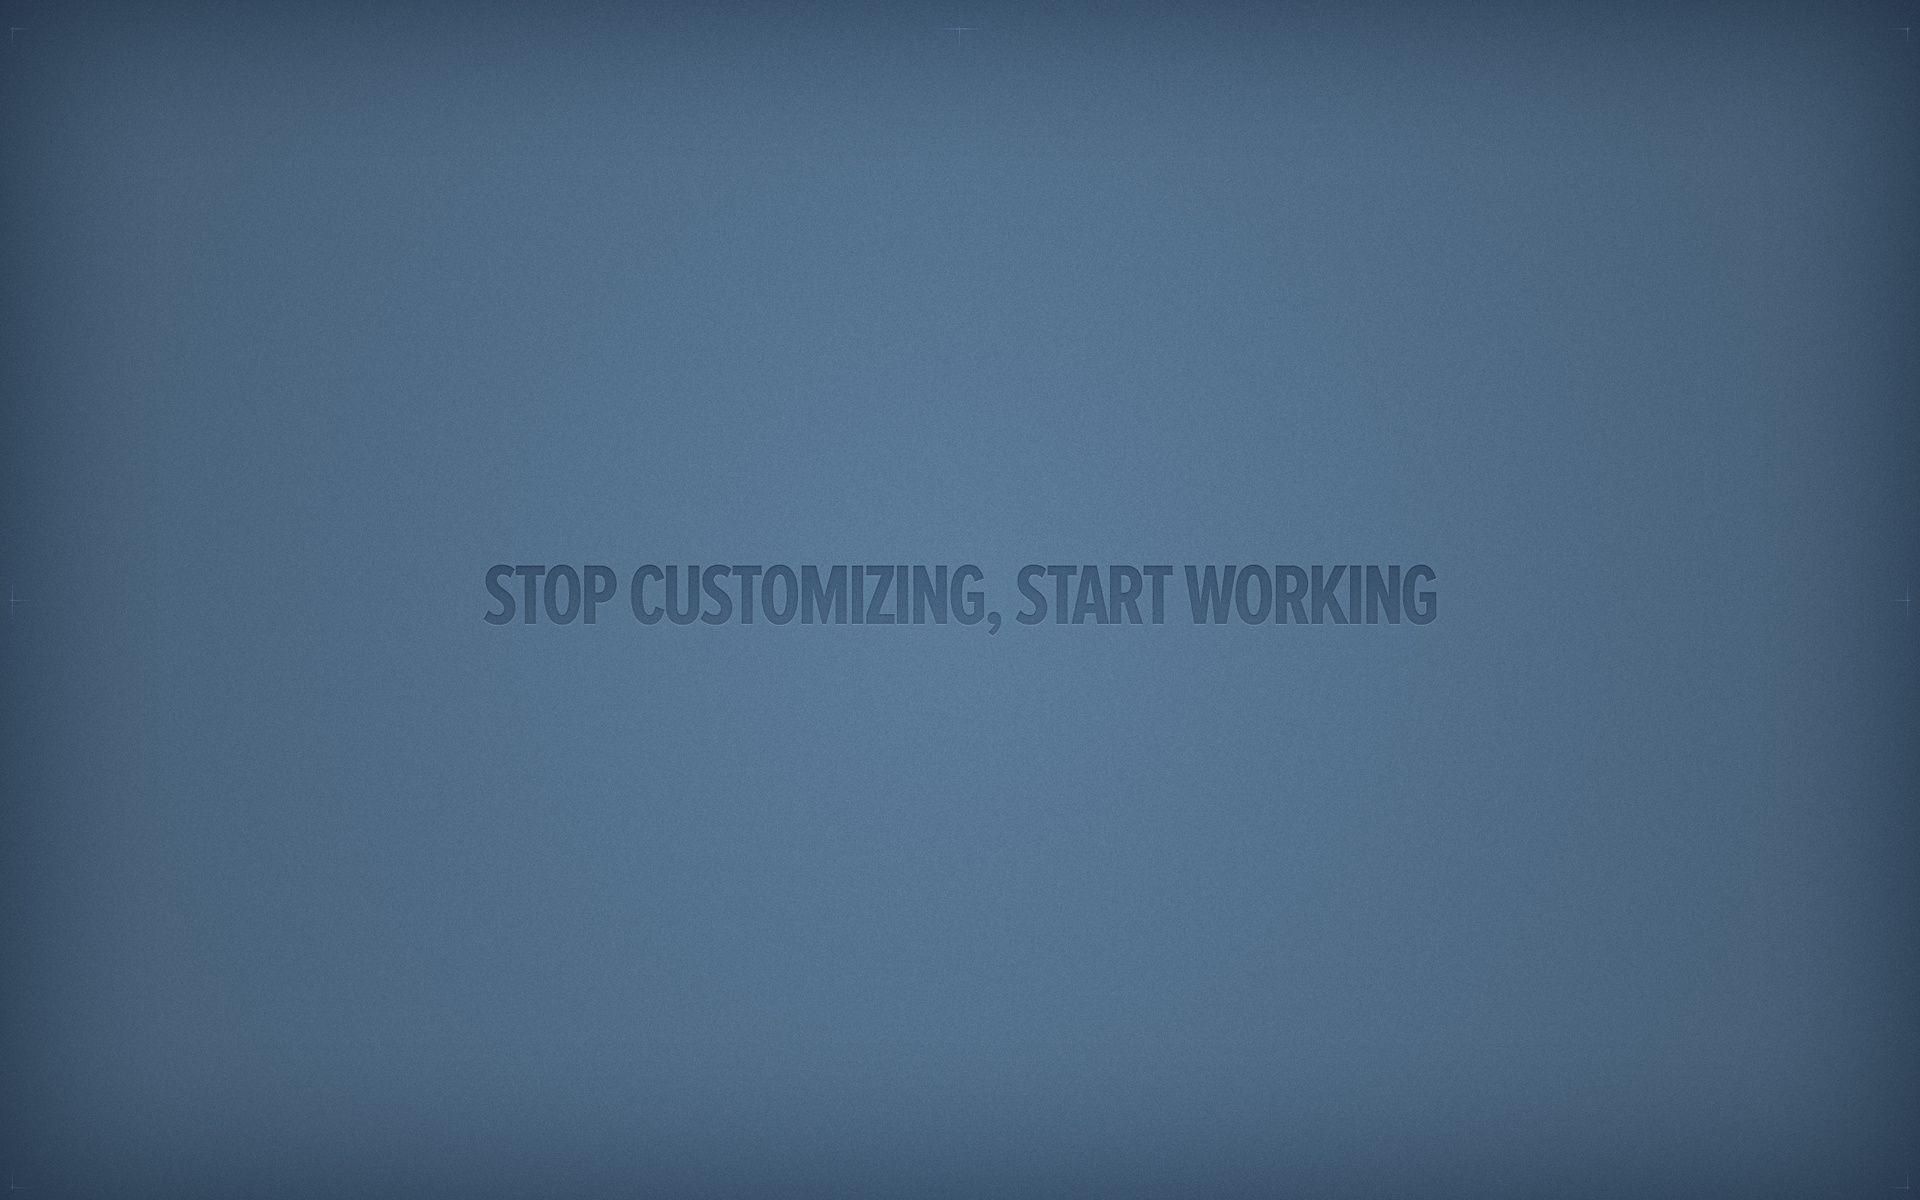 STOP-CUSTOMIZING-START-WORKING